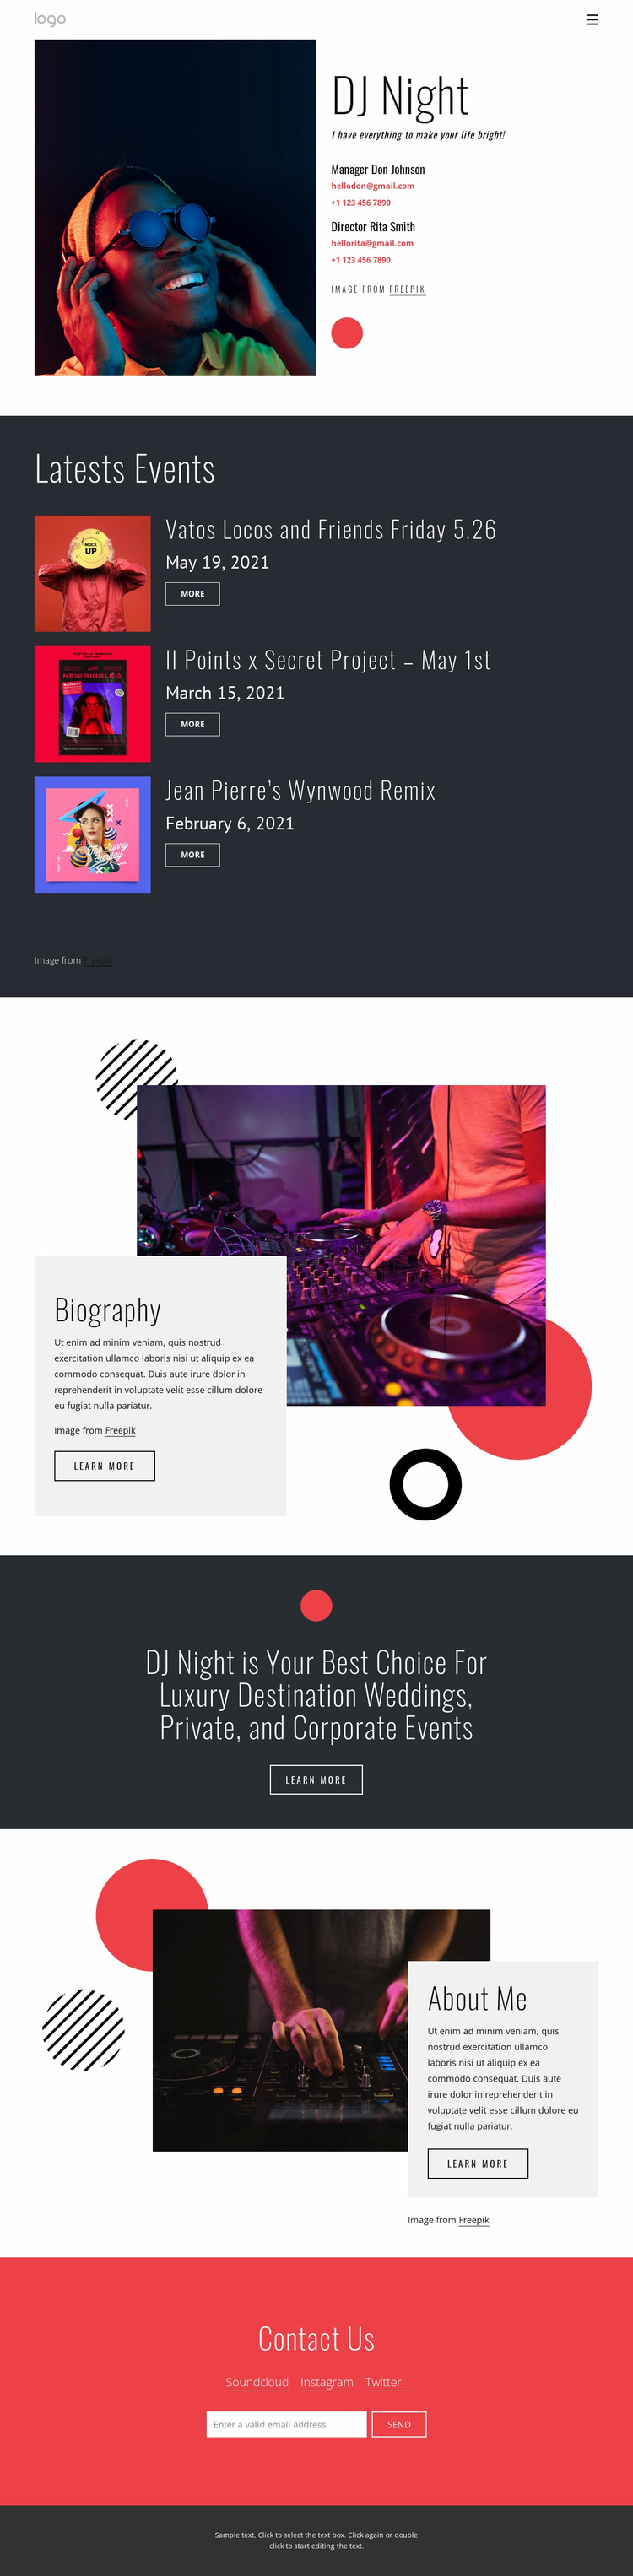 Dj night website Website Design